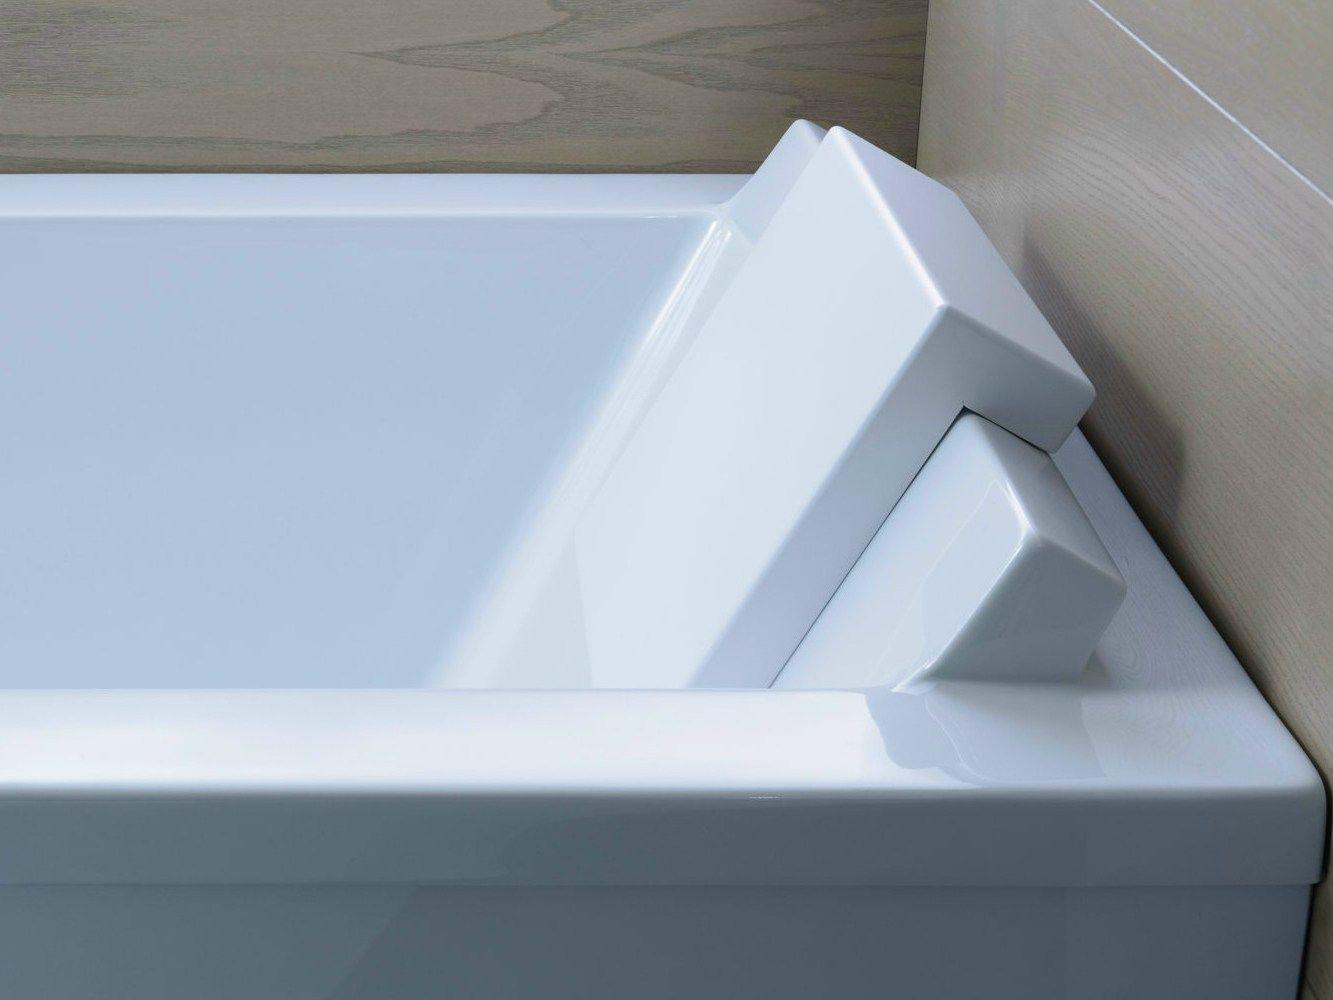 Starck vasca da bagno rettangolare by duravit design philippe starck - Vasca da bagno duravit ...